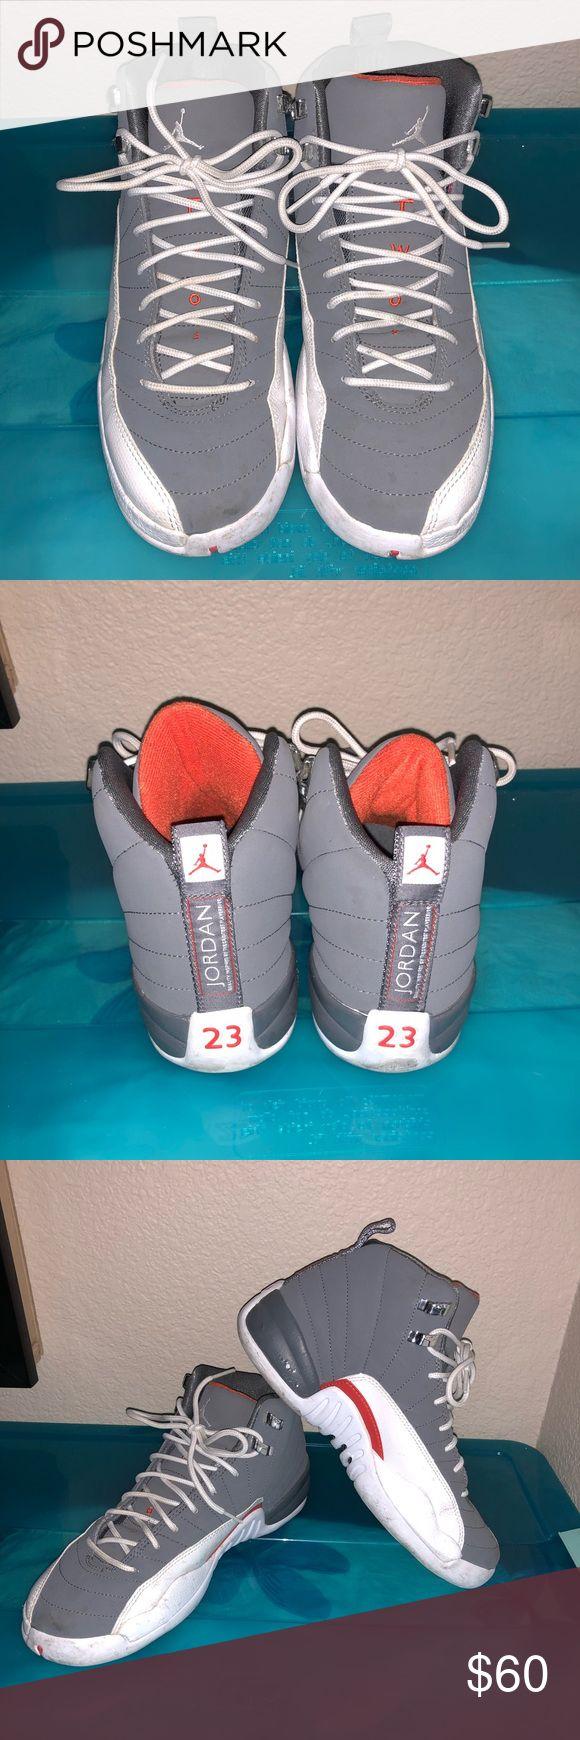 "Retro Jordan 12s Size 6.5Y Retro Jordan 12s ""Cool Grey"" Size 6.5Y (8W). Used. White leather/ cool grey suede. Air Jordan Shoes Athletic Shoes"